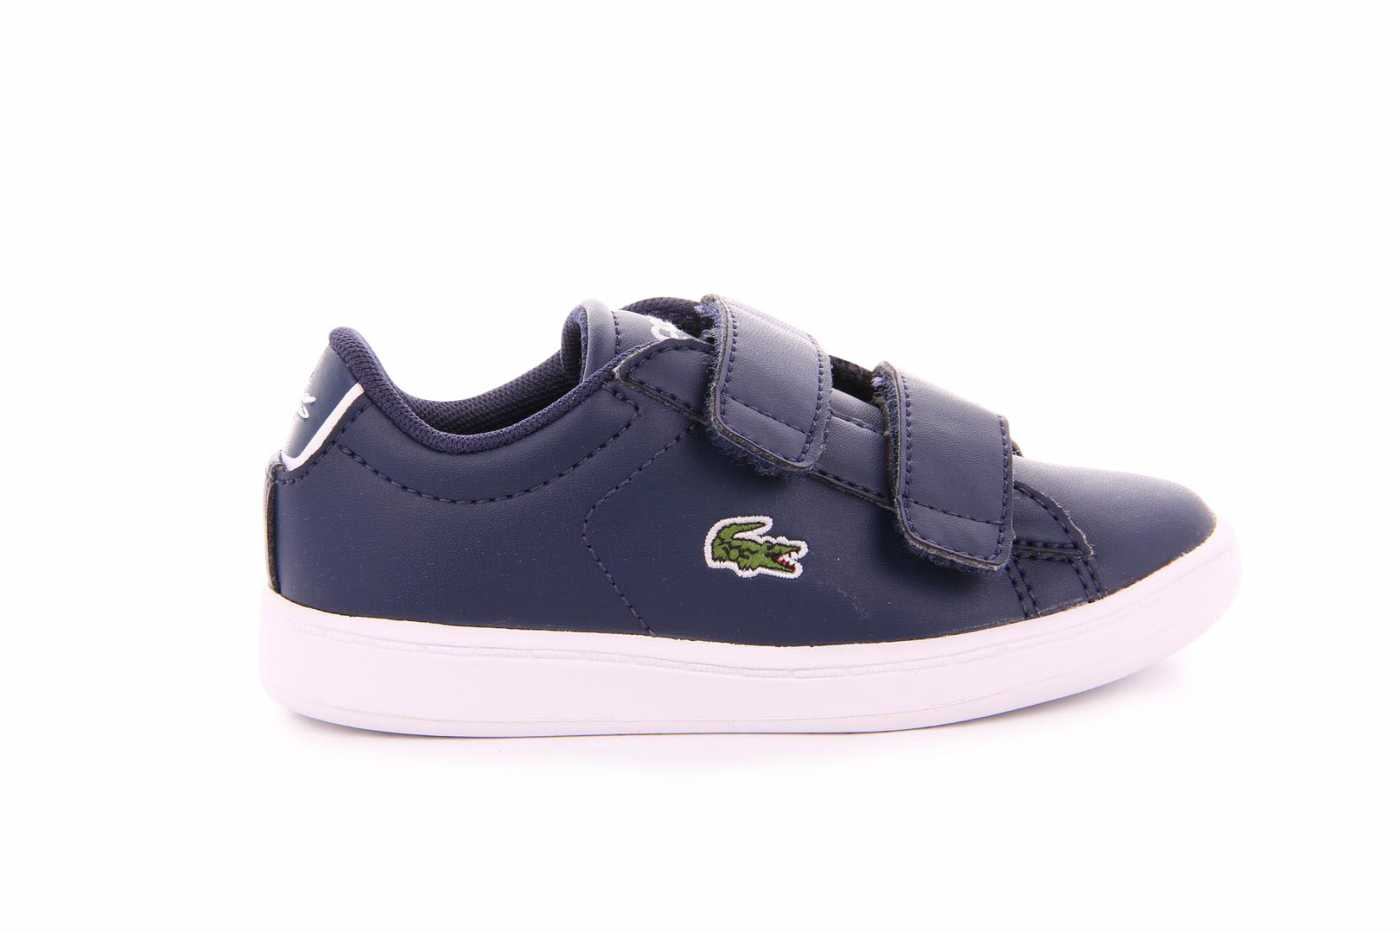 a70786c3e50 Comprar zapato tipo JOVEN NIÑO estilo DEPORTIVO COLOR AZUL PIEL ...